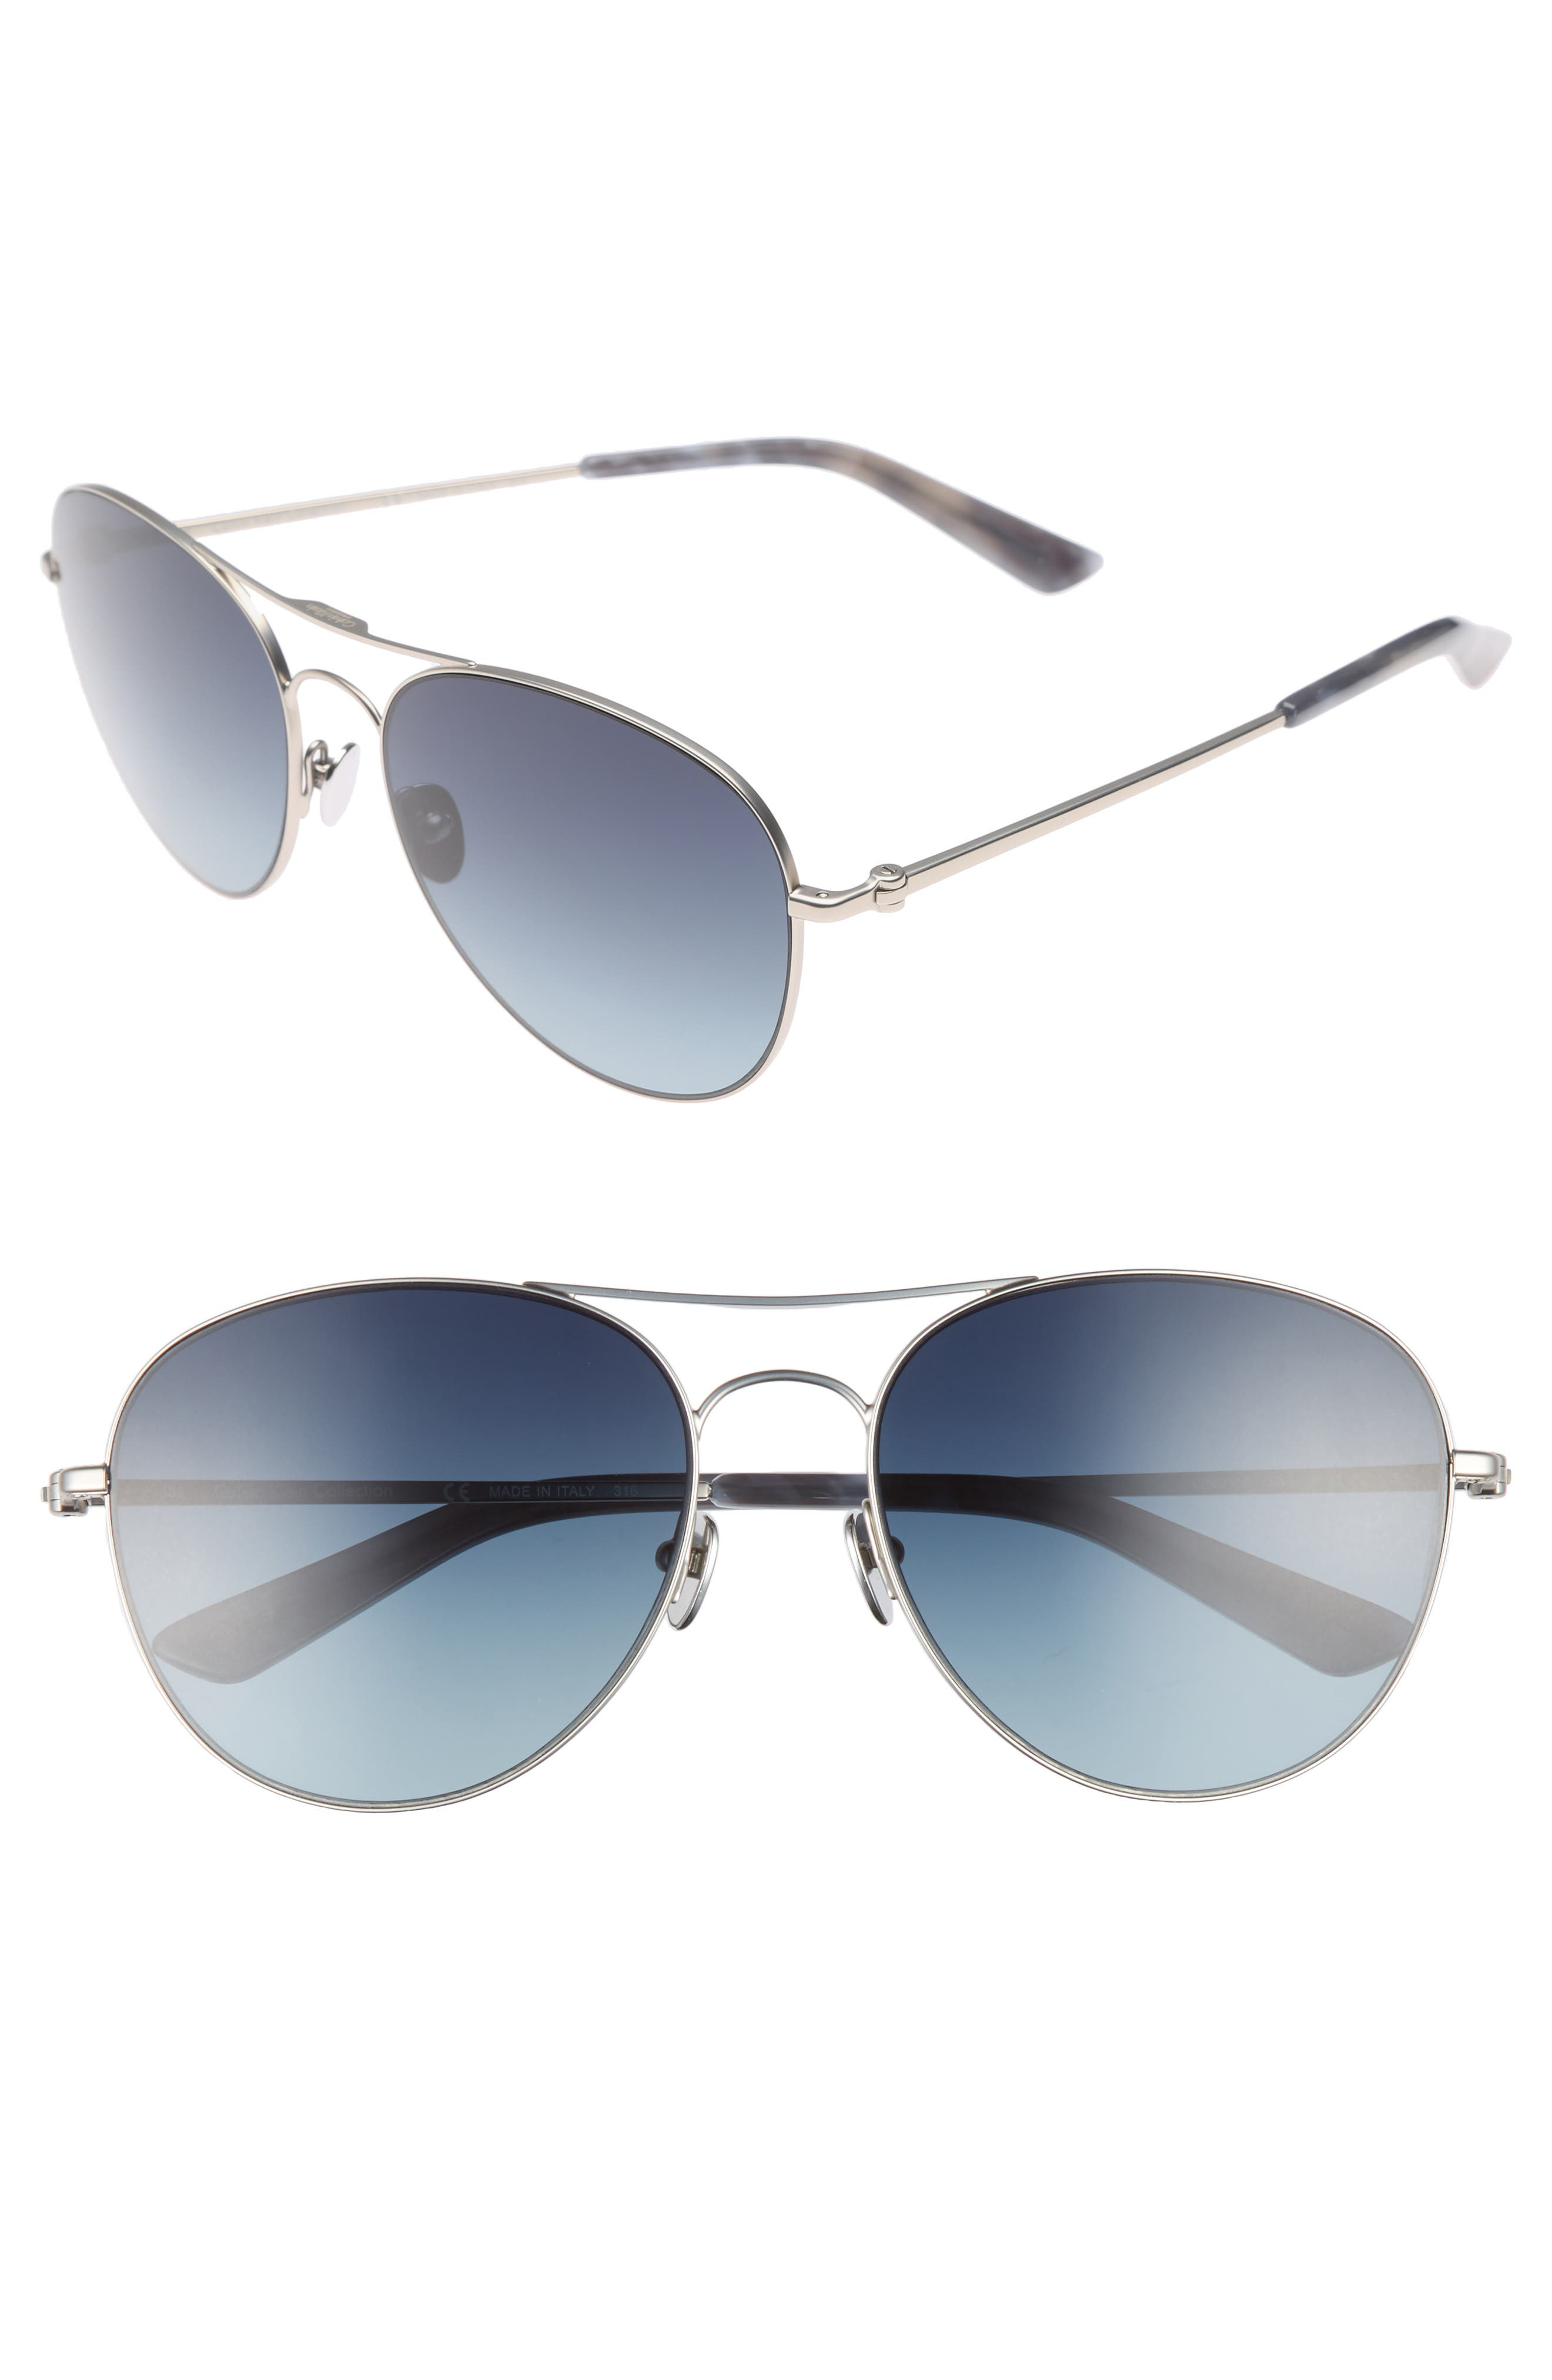 57mm Aviator Sunglasses,                         Main,                         color, Satin Nickel